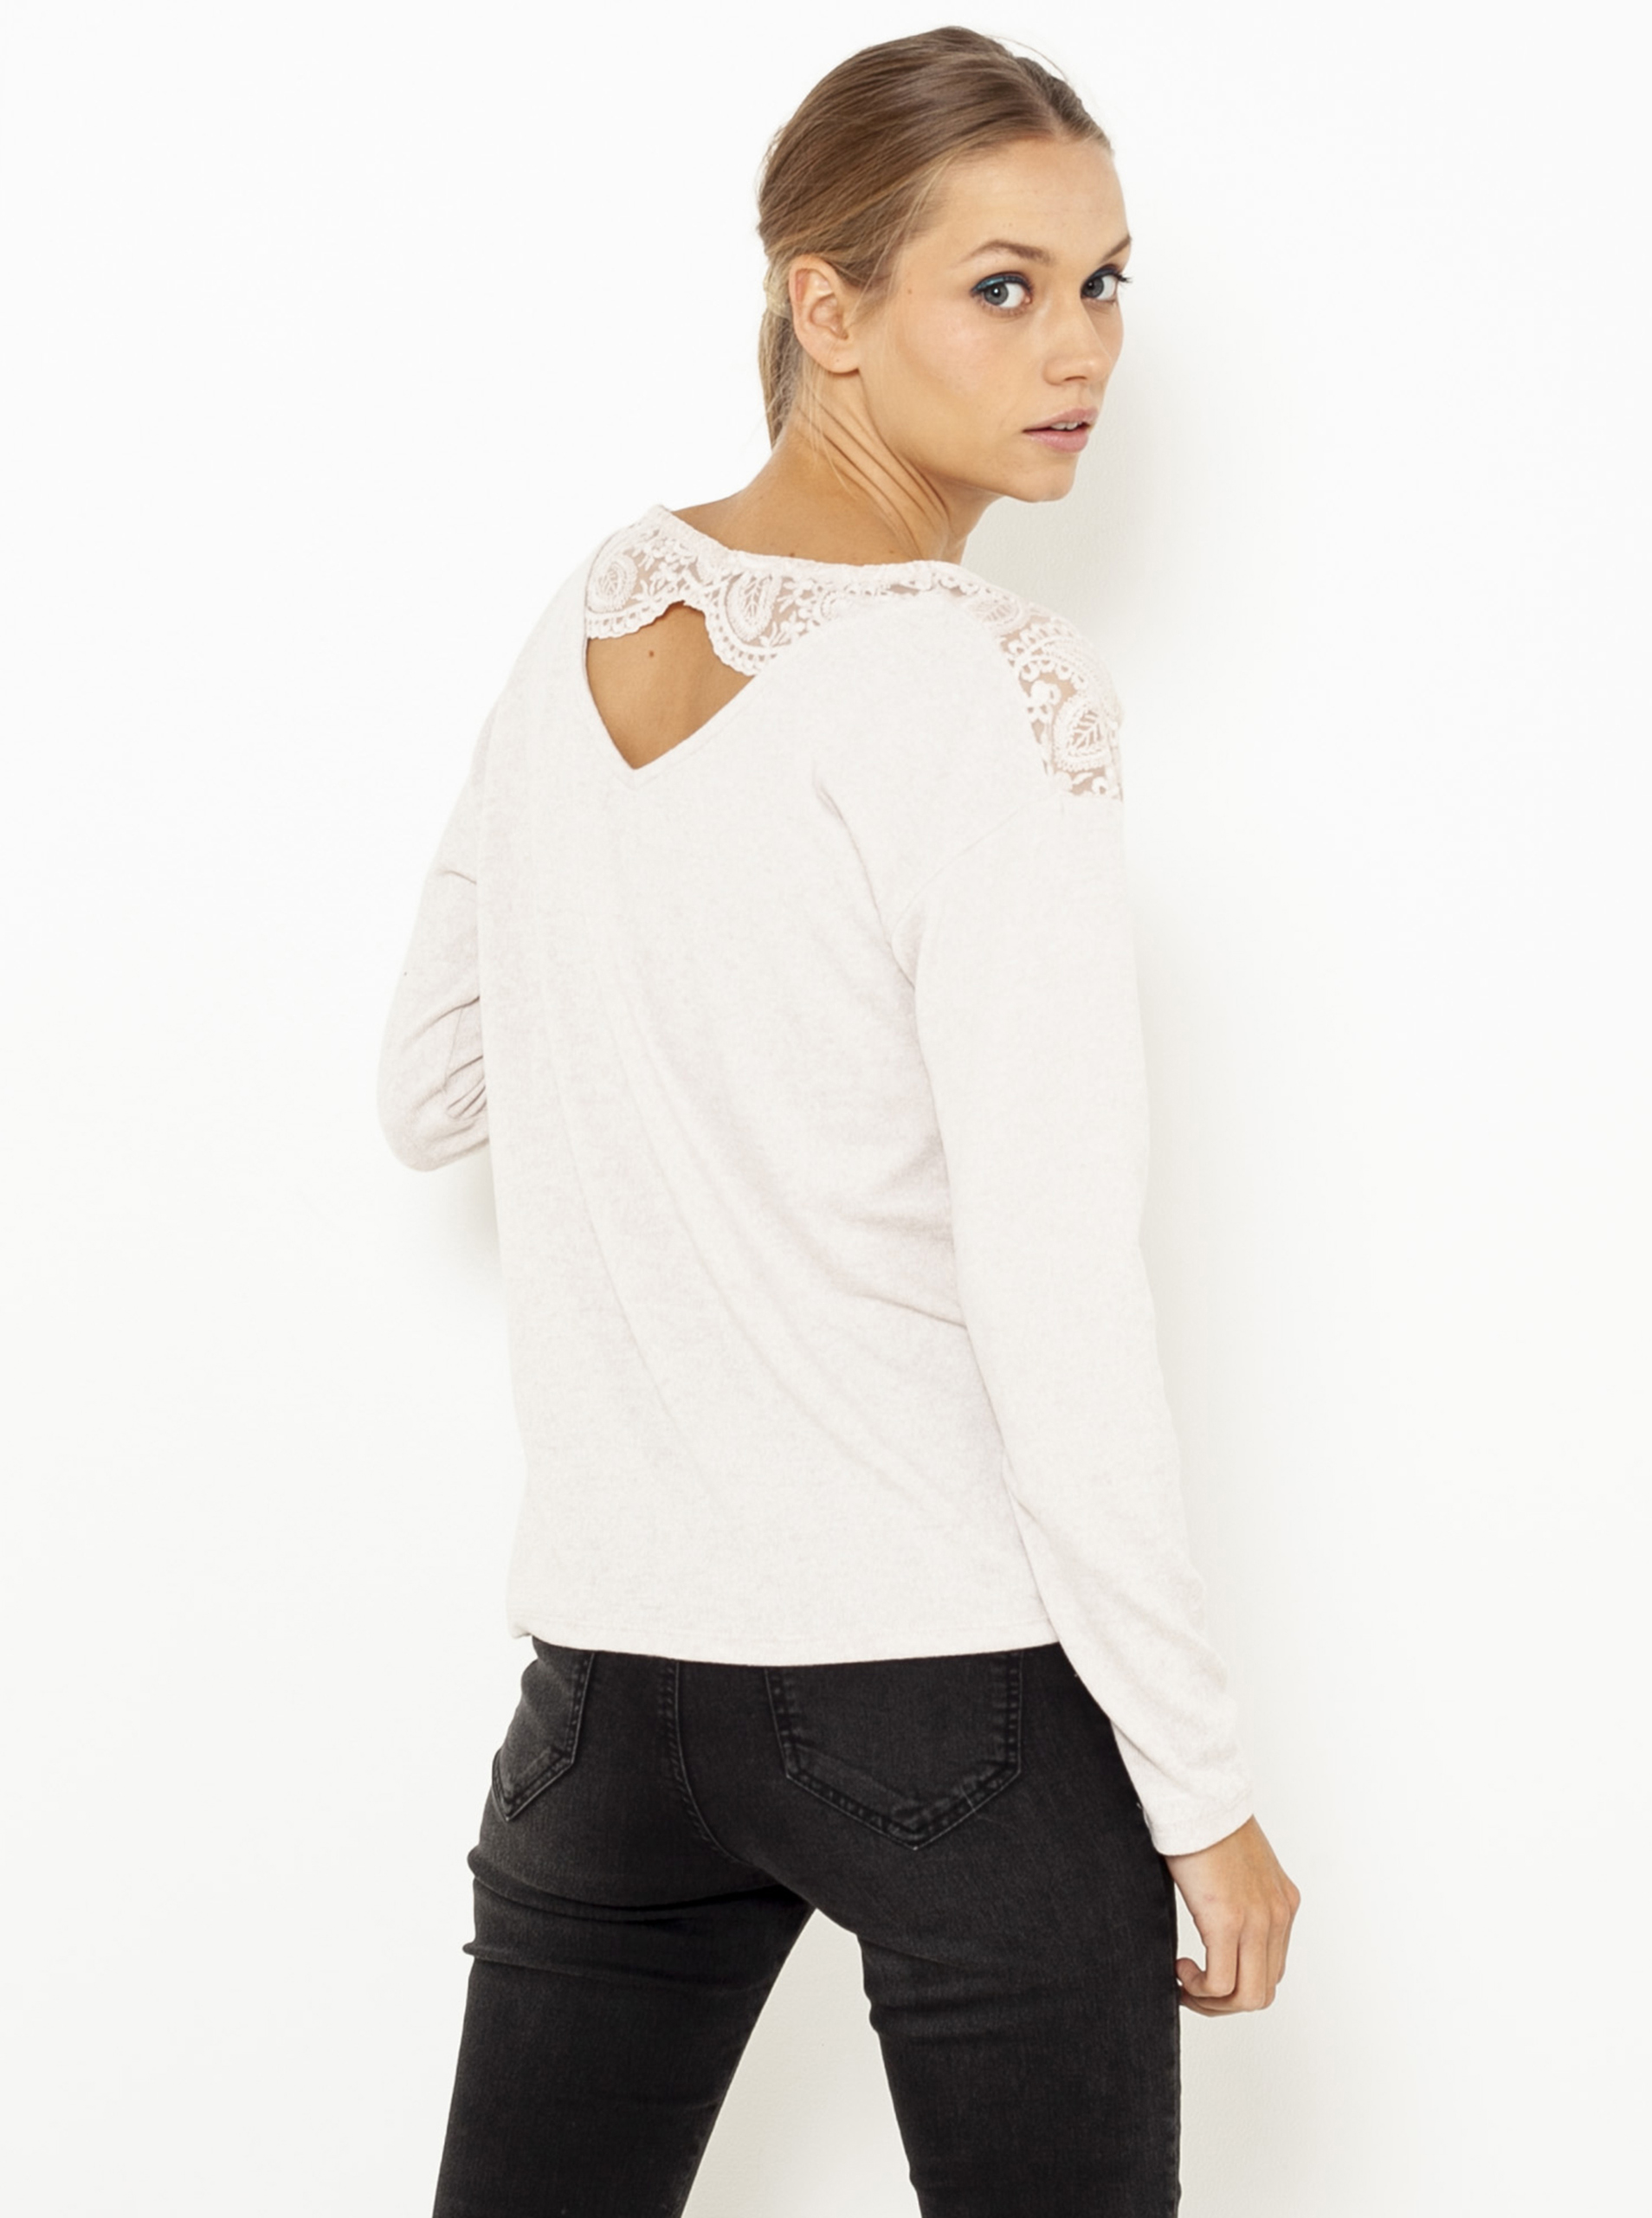 CAMAIEU écru/kremowy damska koszulka z koronką